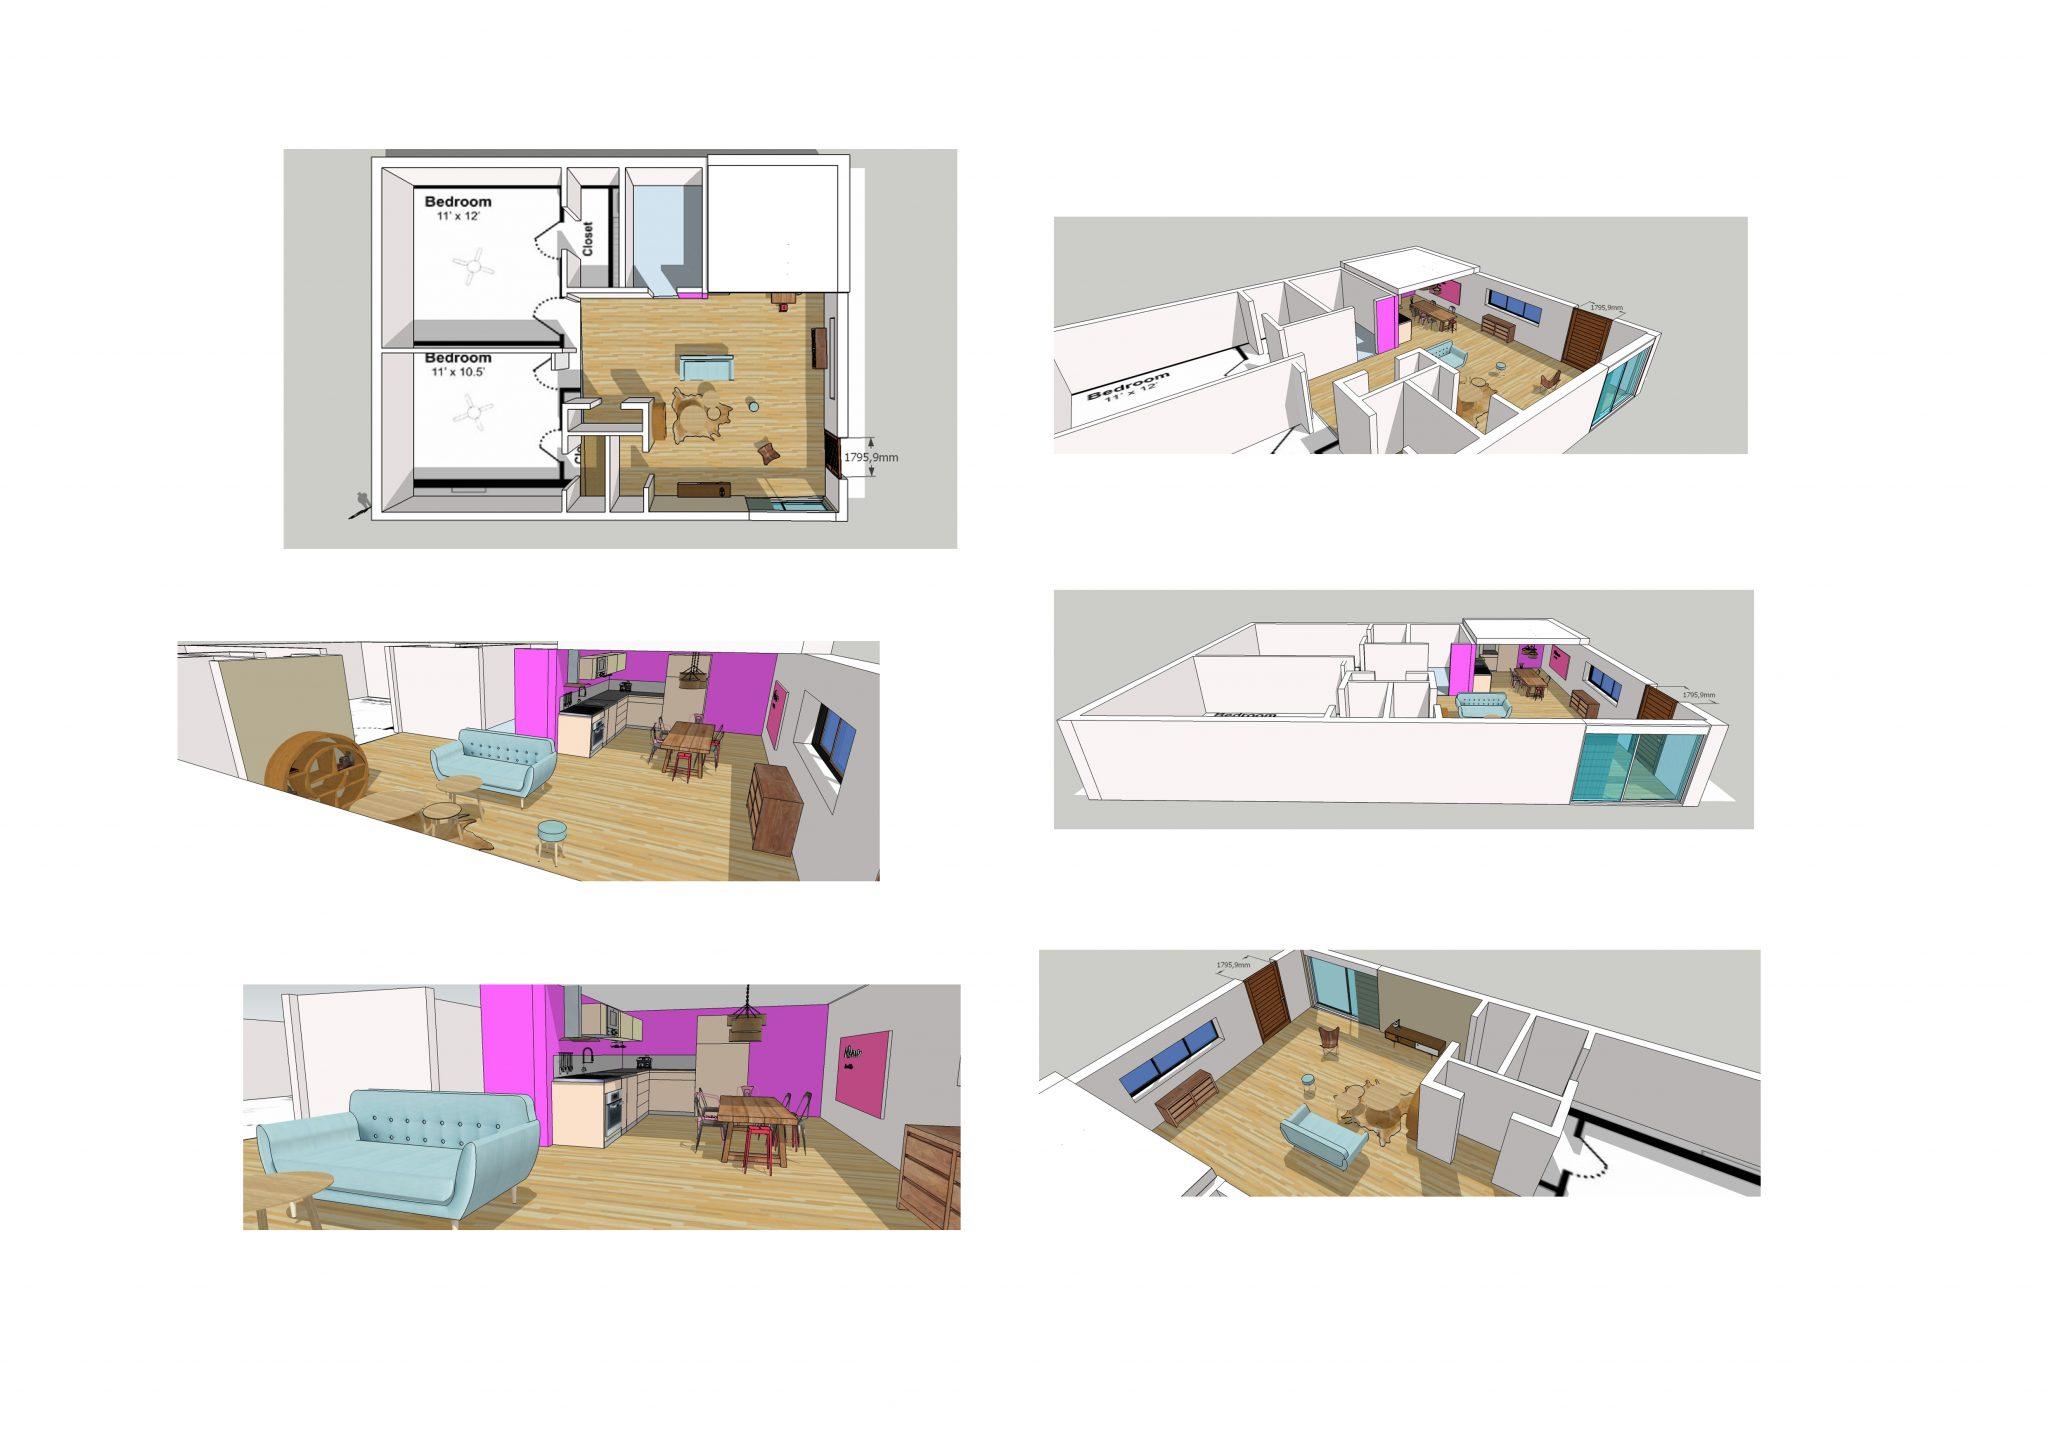 un creation plan 3d l 39 impression 3d. Black Bedroom Furniture Sets. Home Design Ideas